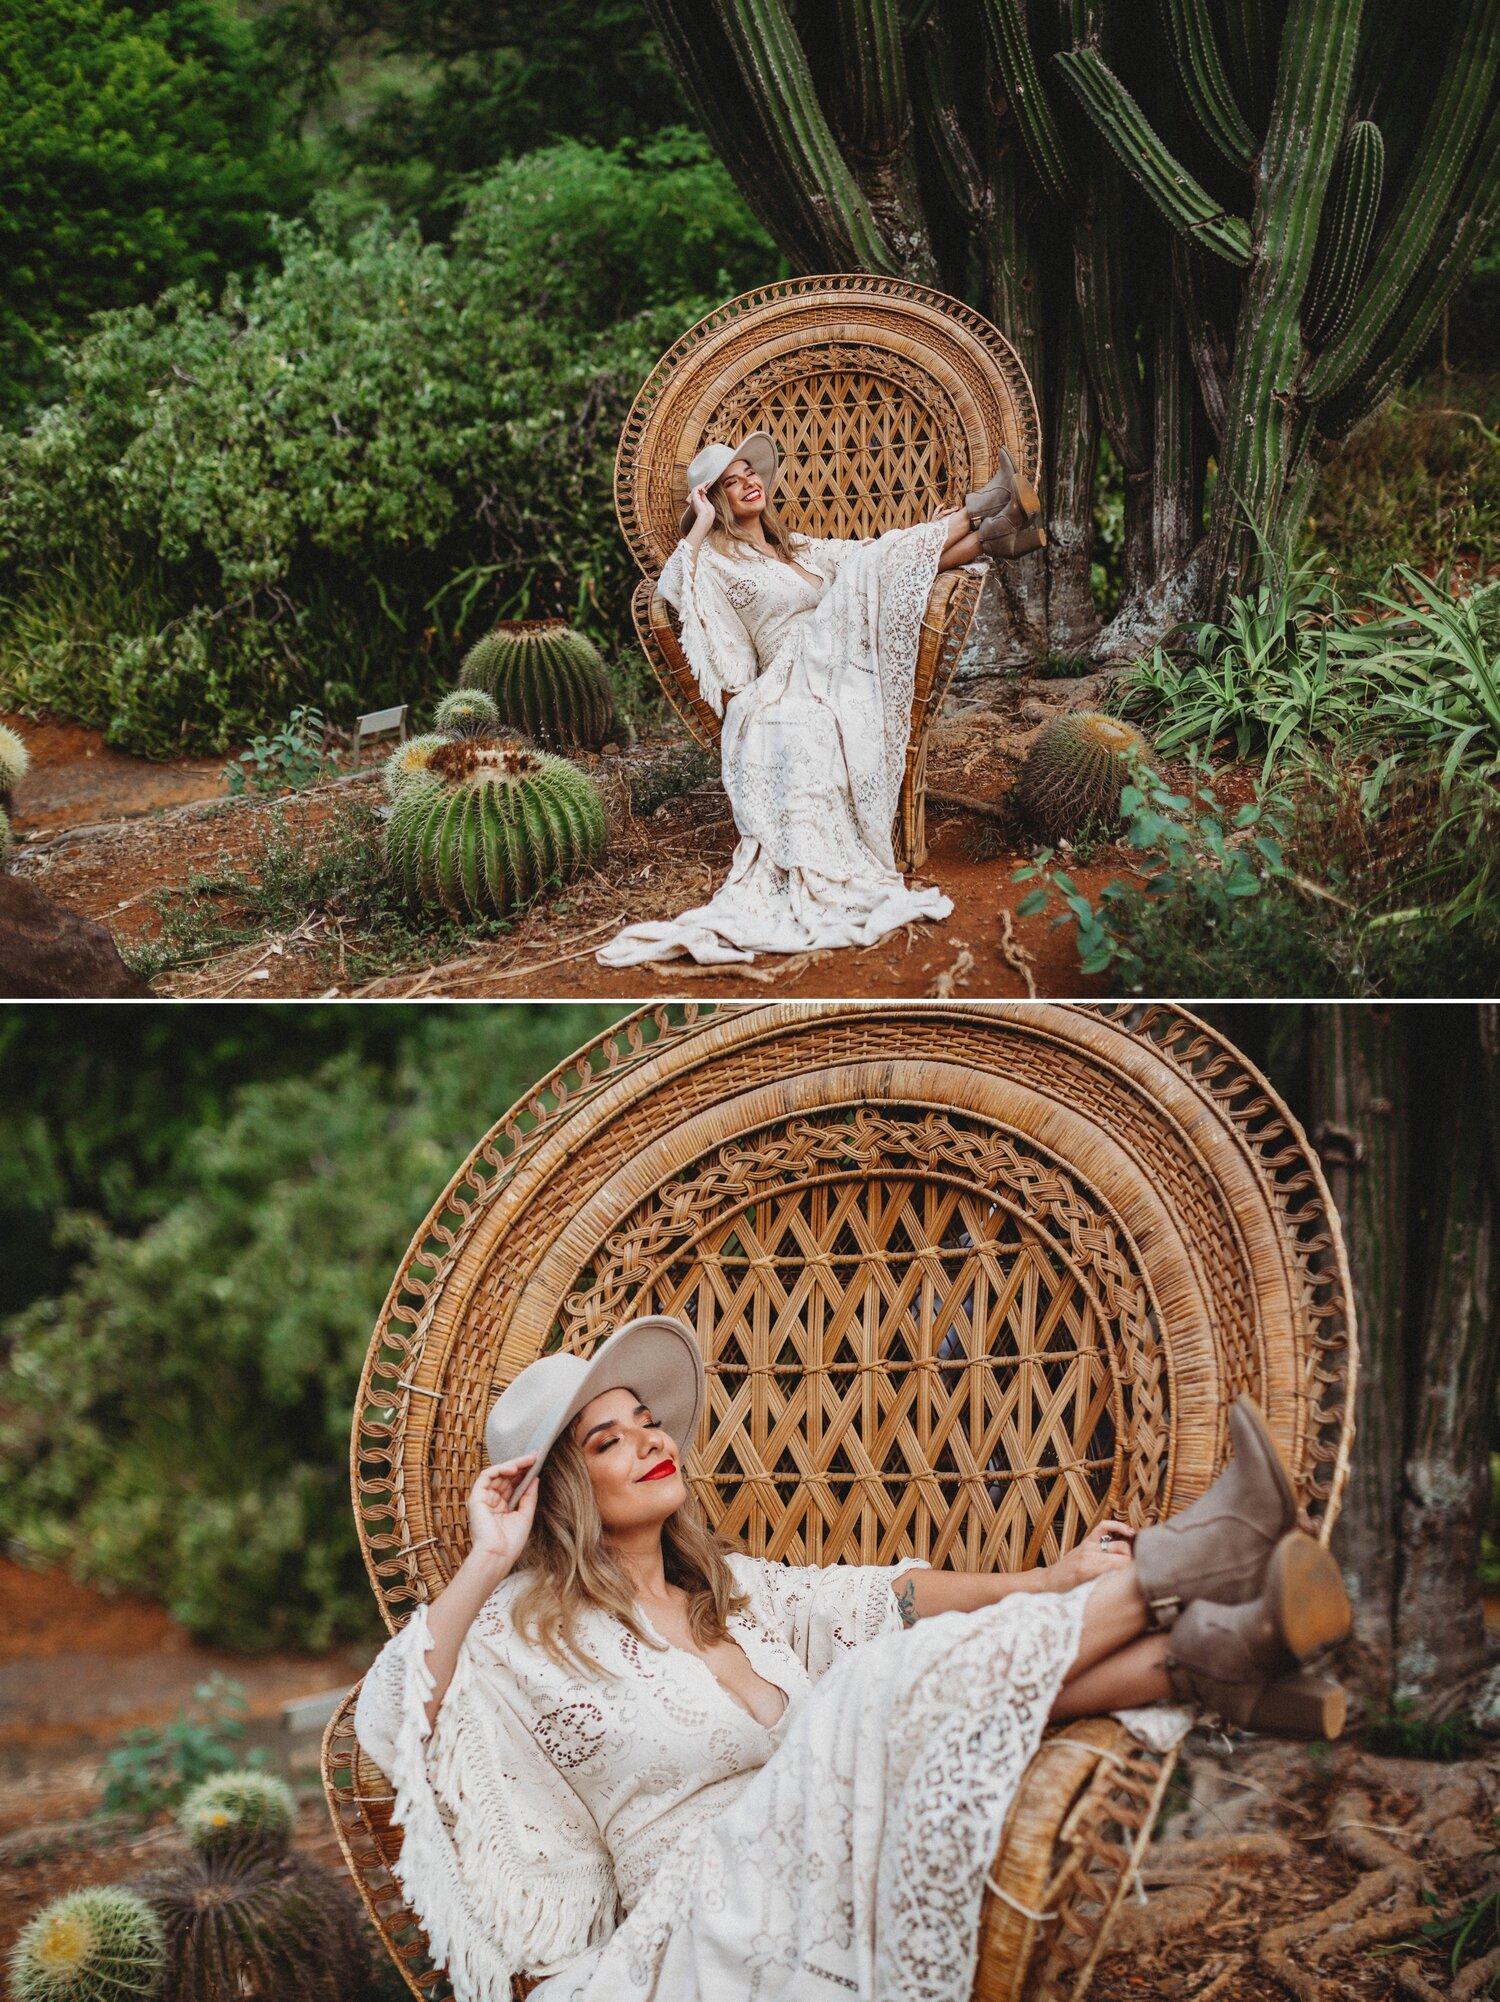 Boho Cactus Elopement - Honolulu, Koko Crater Botanical Garden - Oahu Hawaii Wedding Photographer 11.jpg